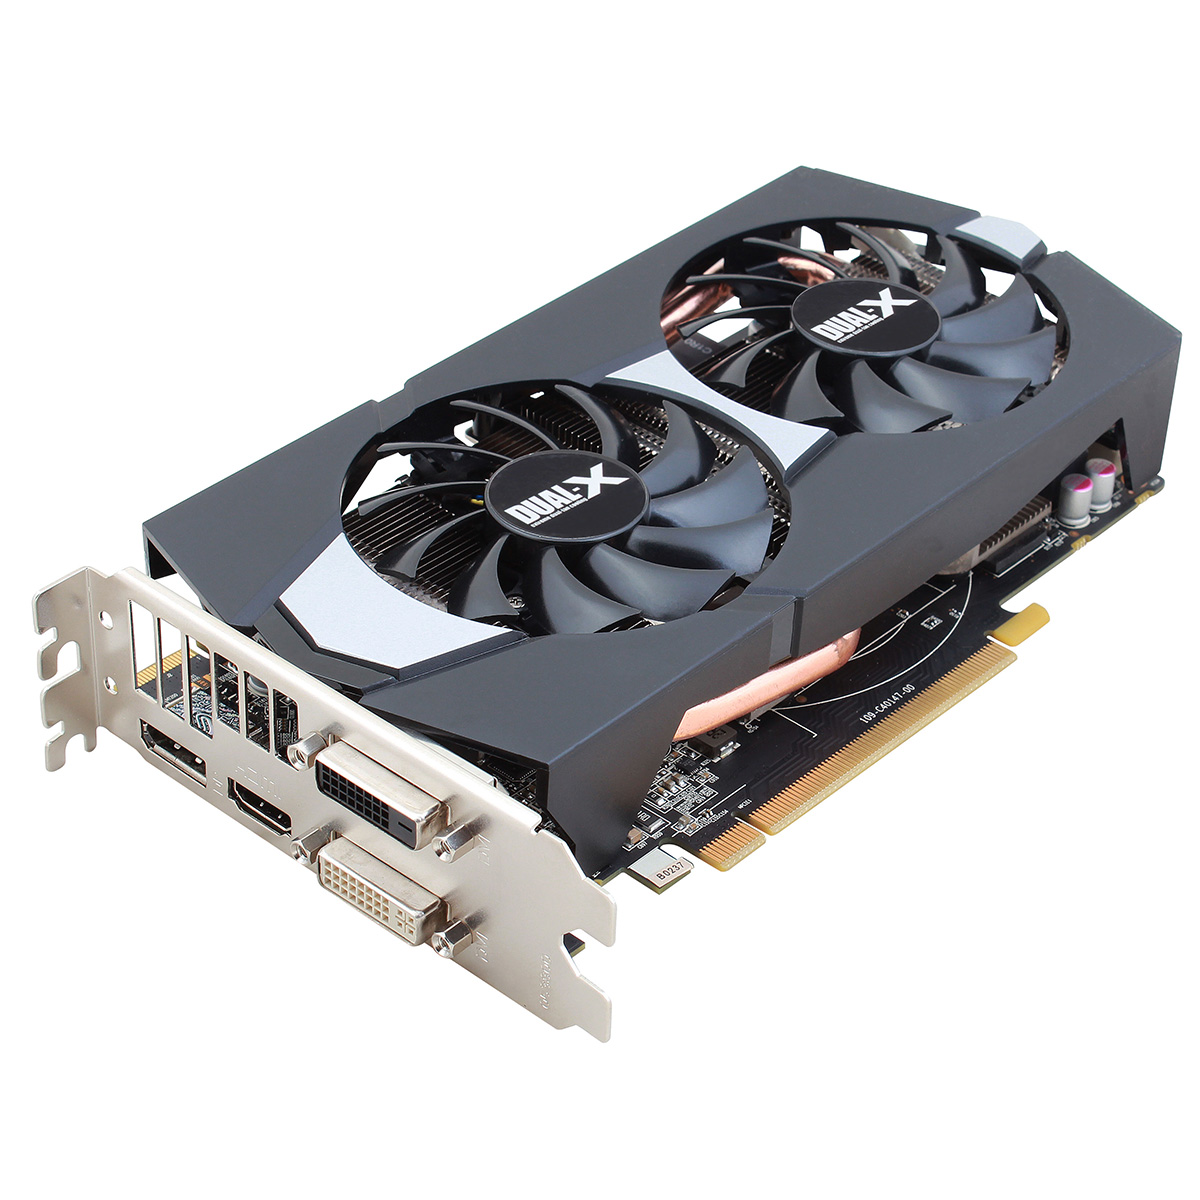 Carte graphique Sapphire Radeon R9 270 Dual-X 2G GDDR5 OC 2 Go Dual DVI/HDMI/DisplayPort - PCI Express (AMD Radeon R9 270)